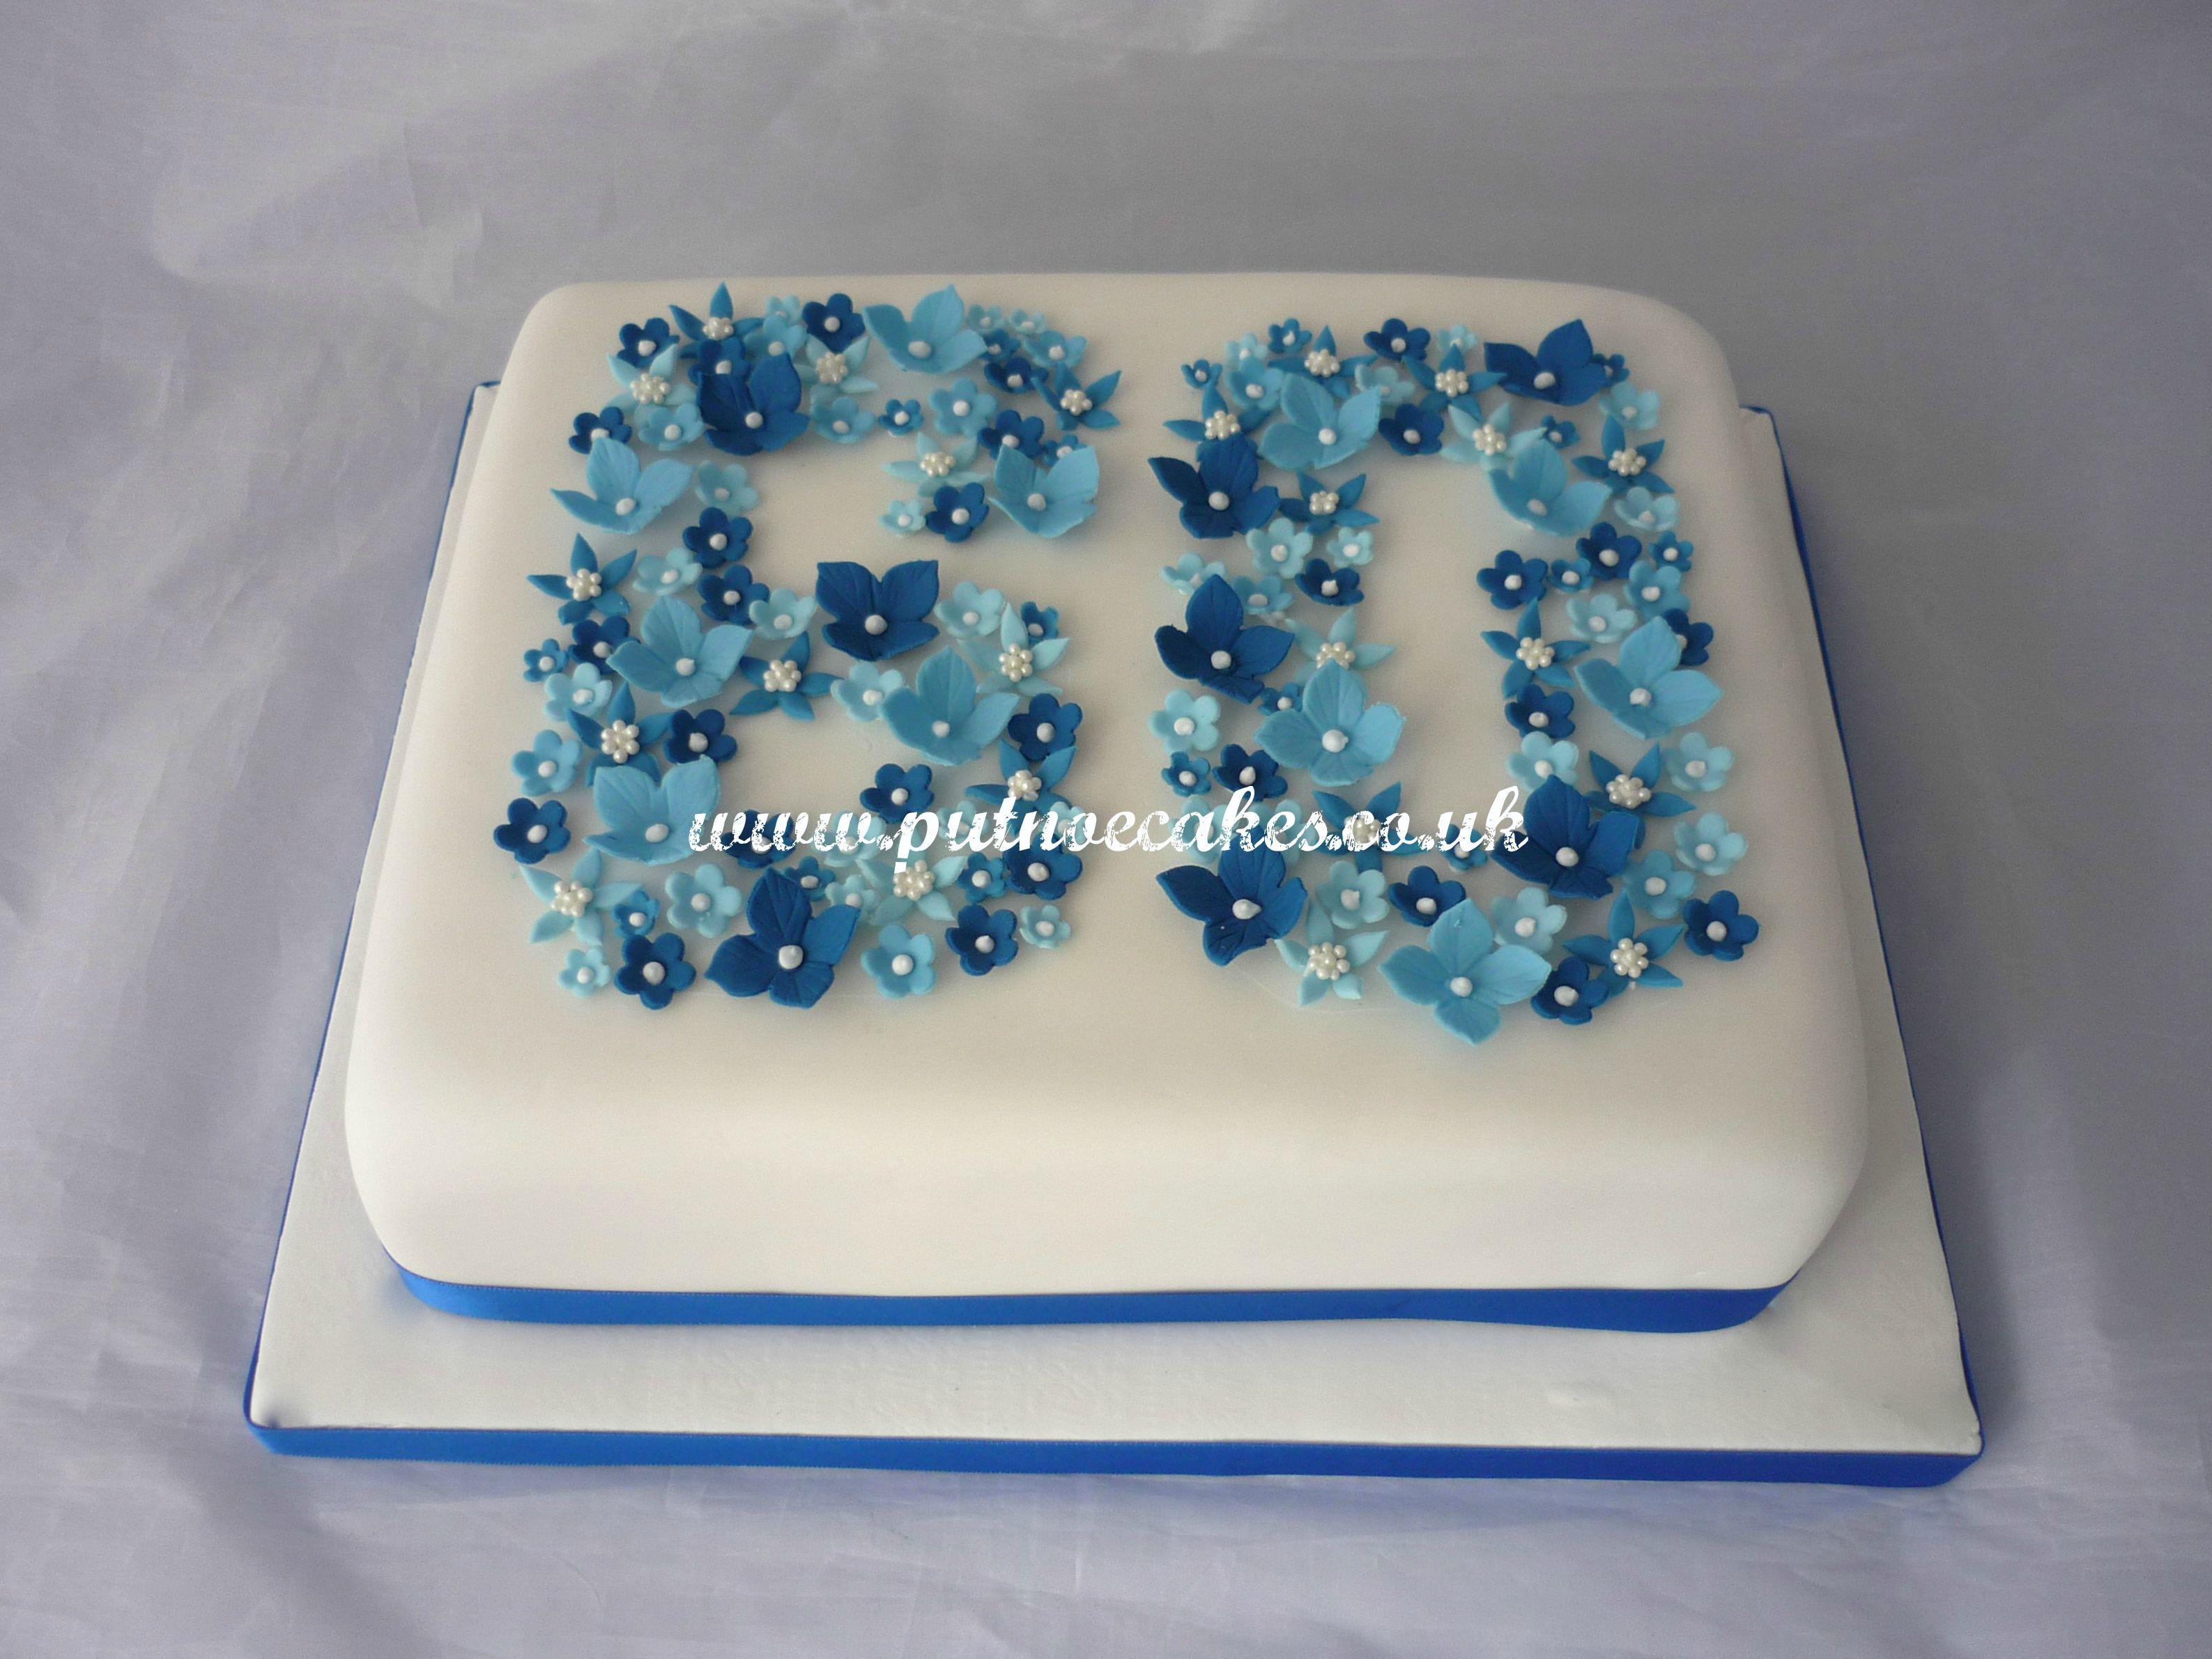 Ladies Birthday Cakes Putnoe Cakes Birthdays Pinterest